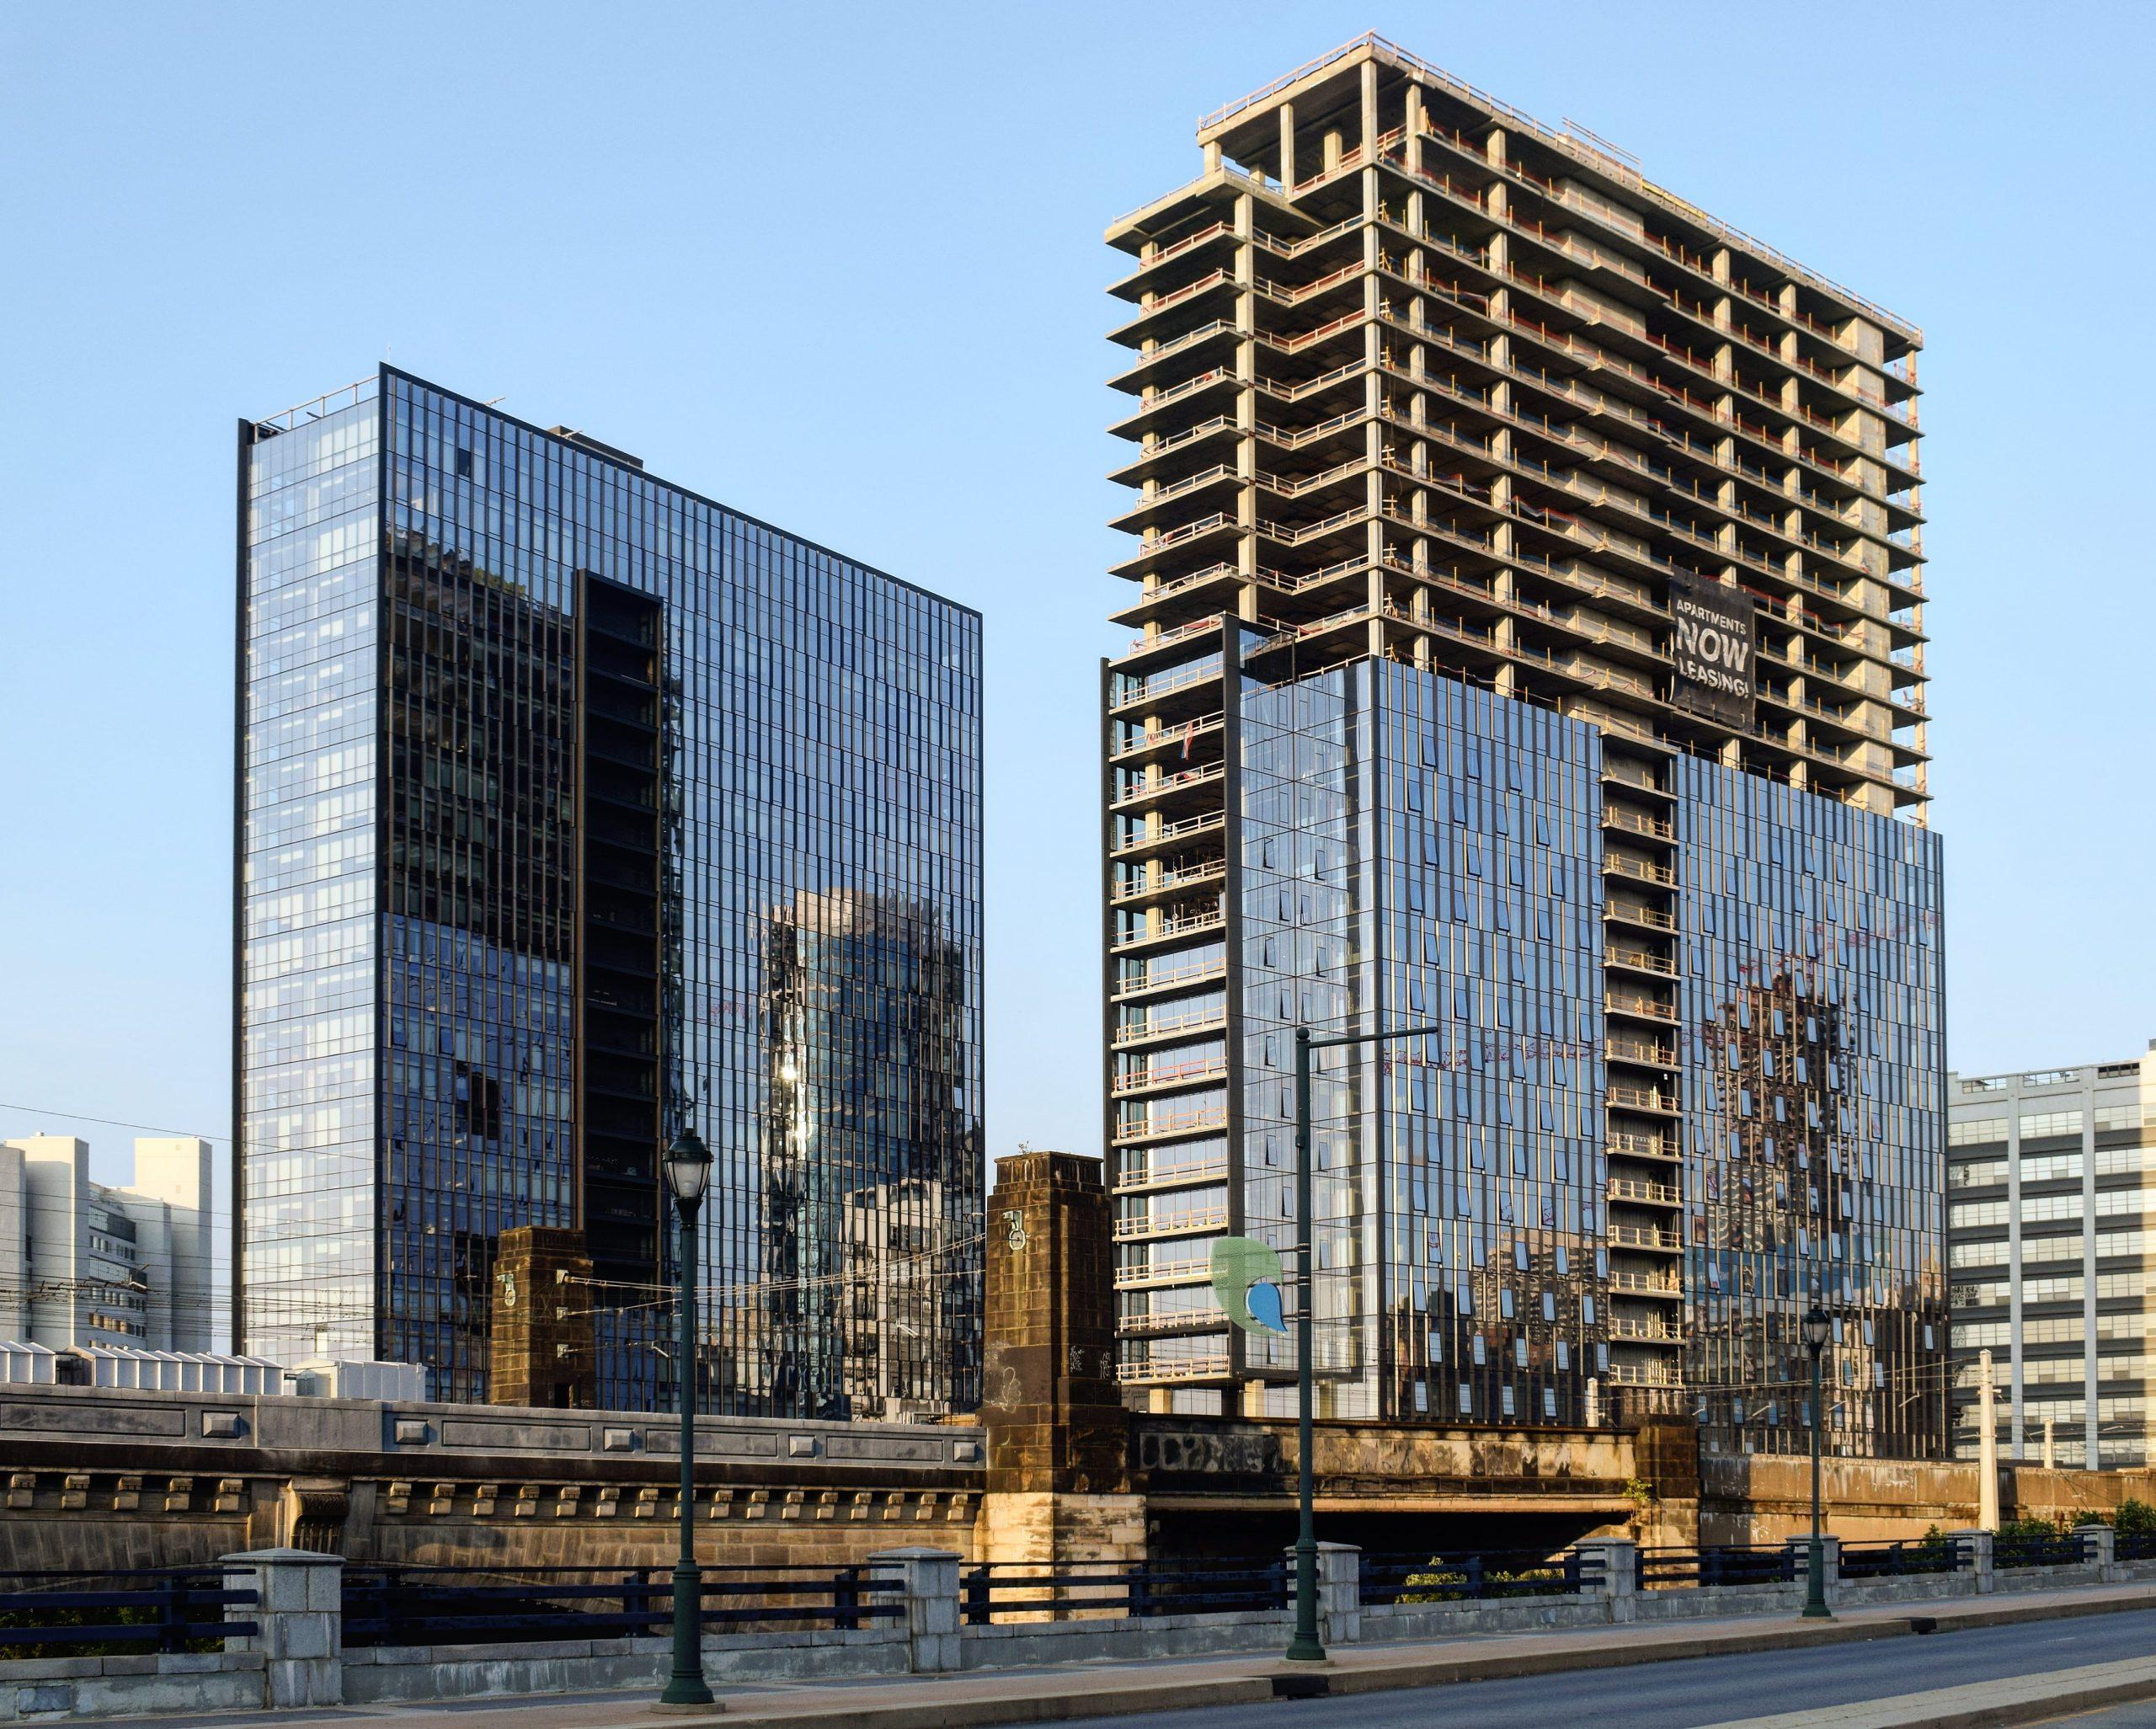 Riverwalk towers from John F. Kennedy Boulevard. Photo by Thomas Koloski